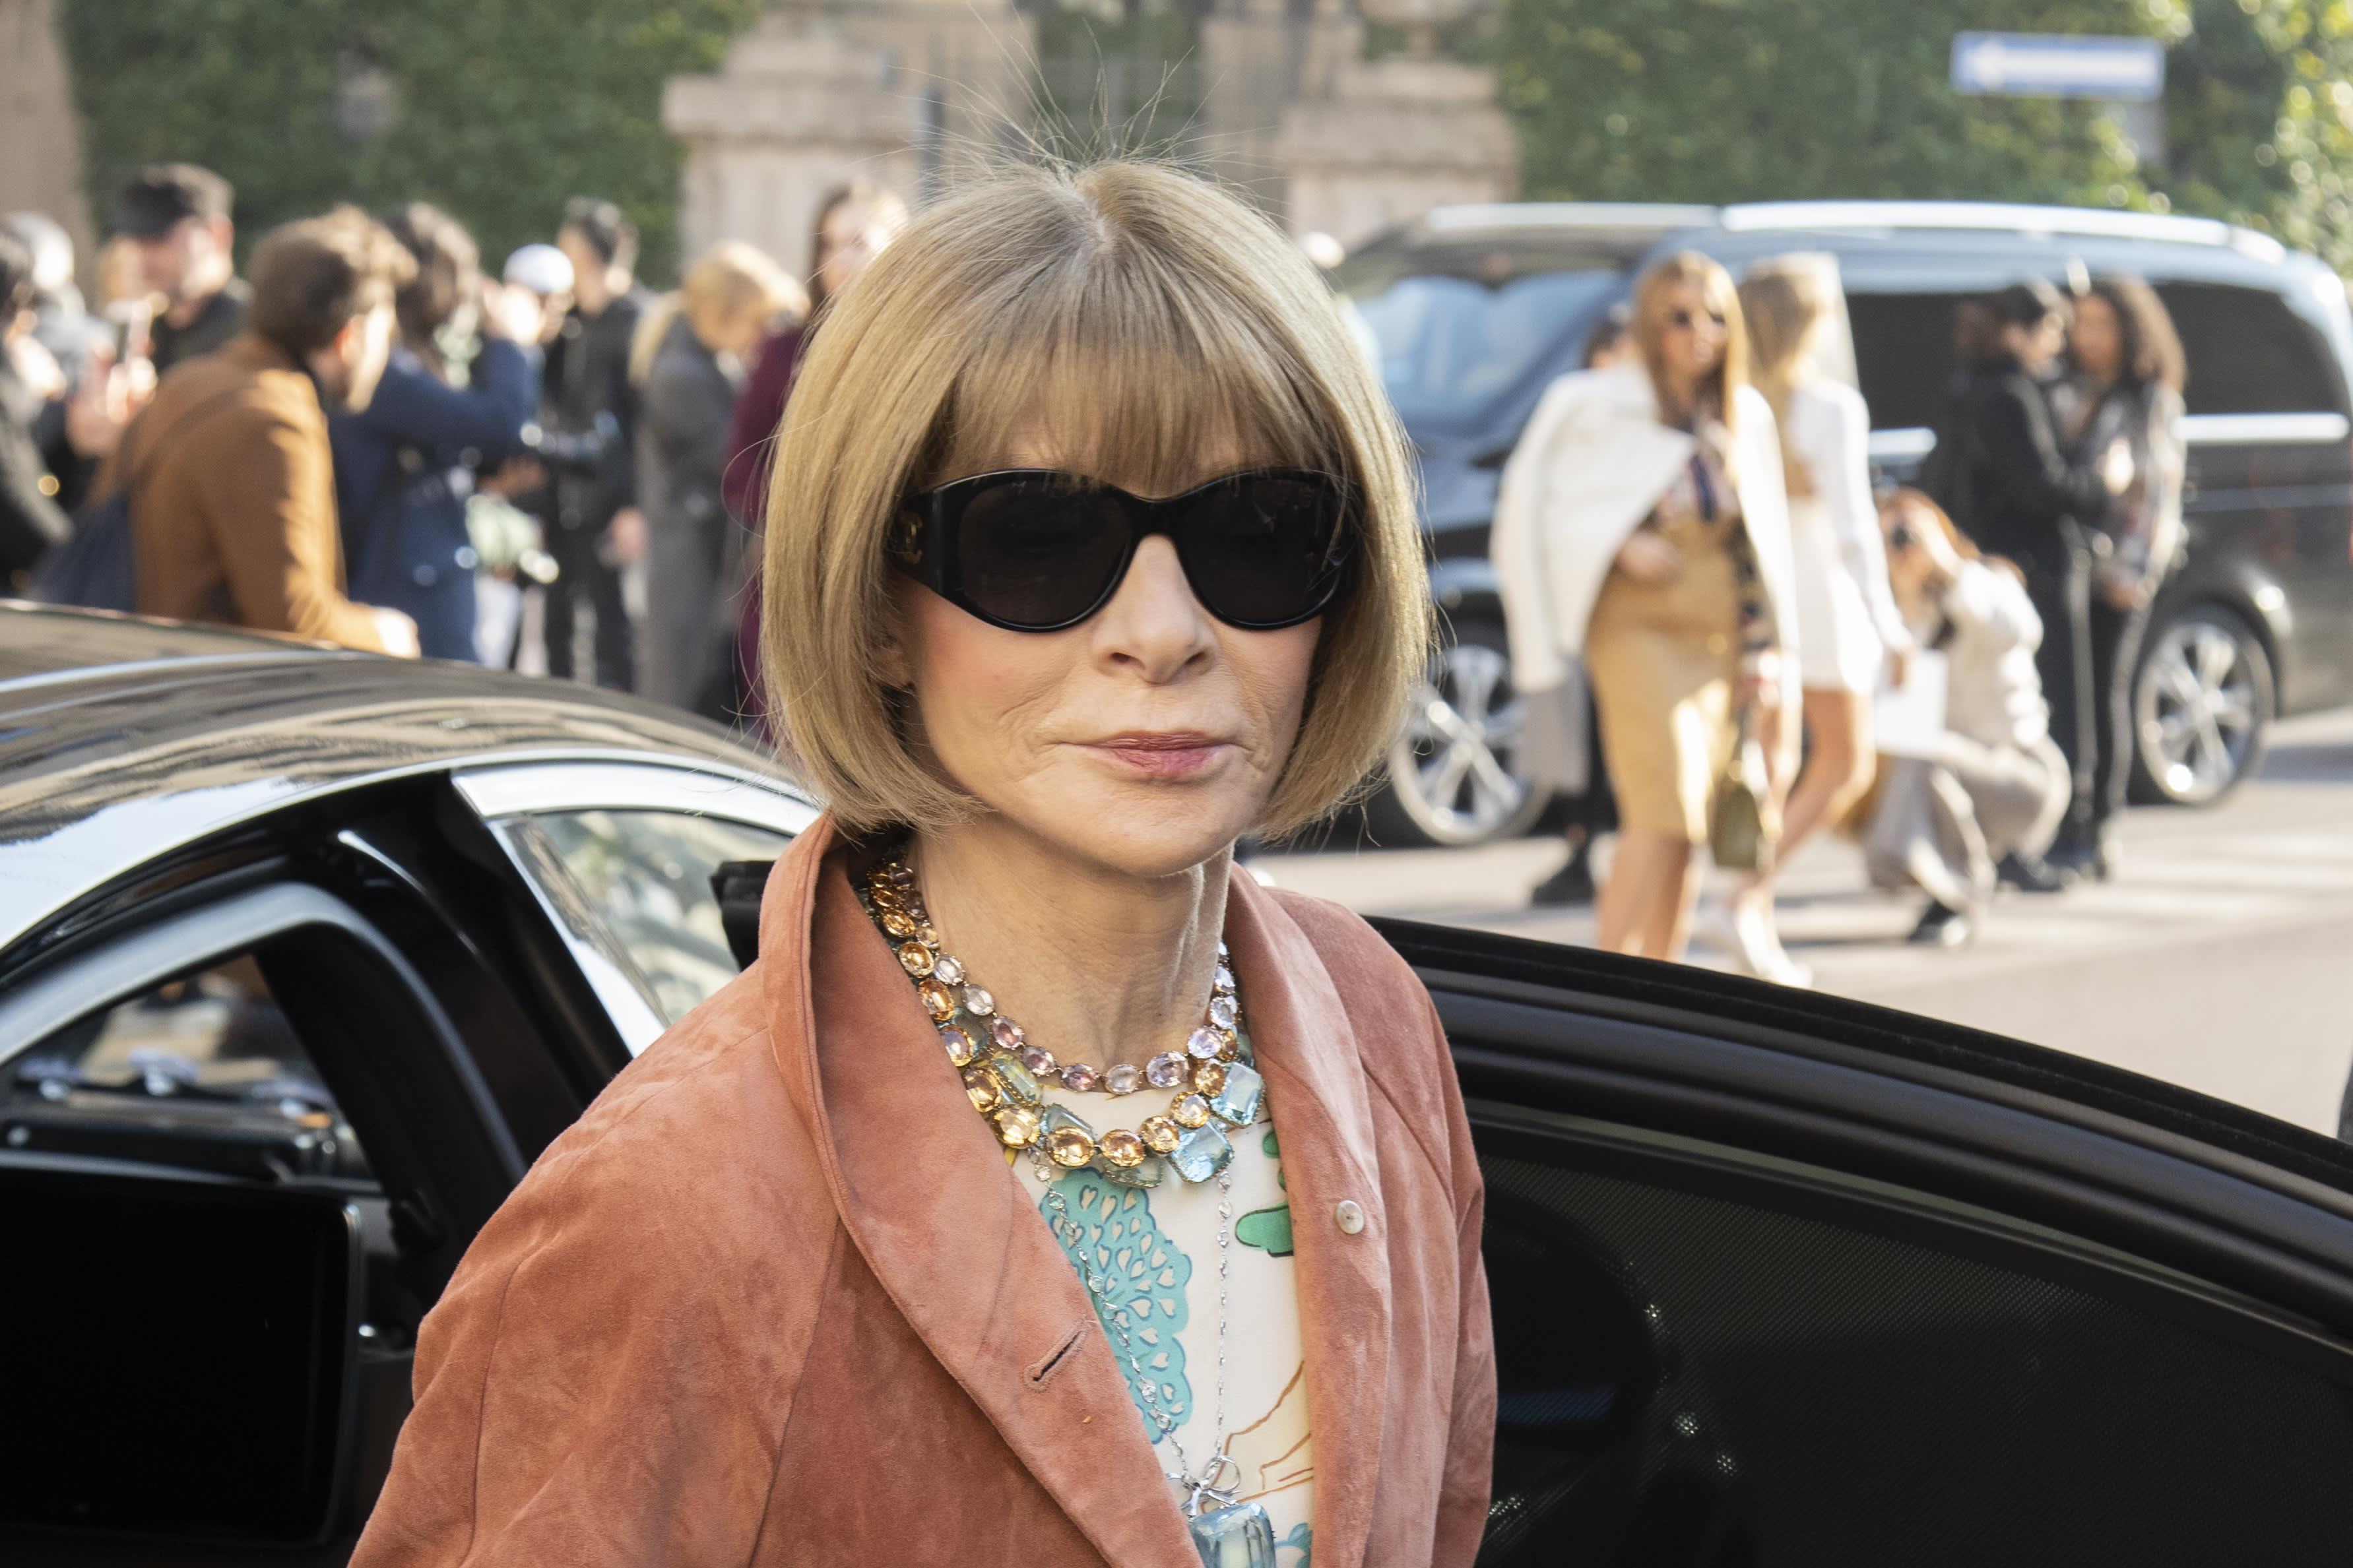 Coronavirus has been 'catastrophic' for fashion industry